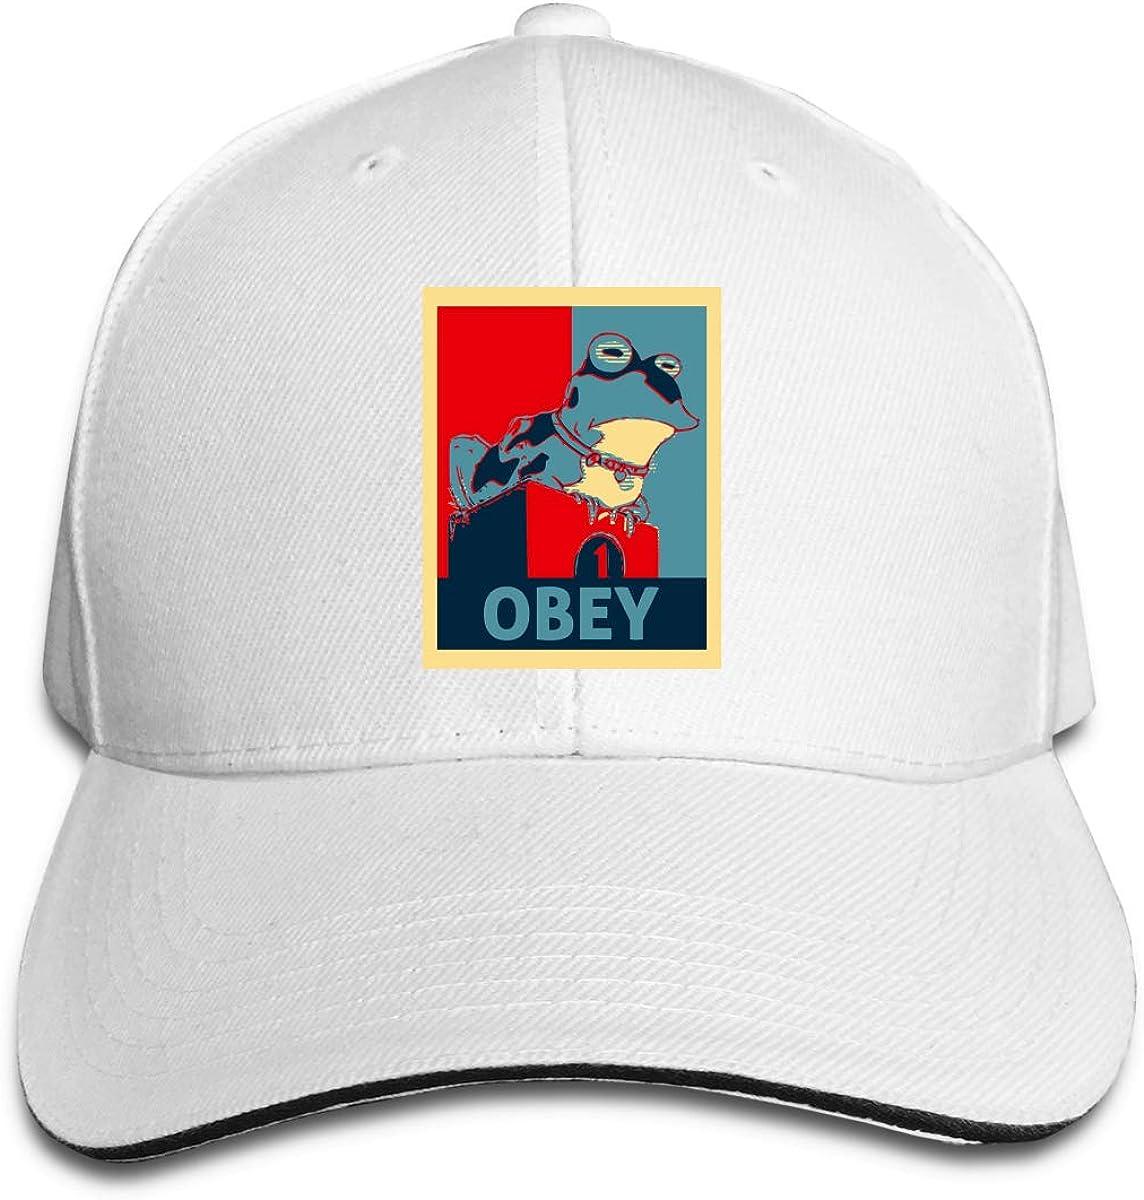 Wanjirong Mens Womens Baseball Caps Adjustable Frog Obey Hypnotoad Sun Hats Unisex